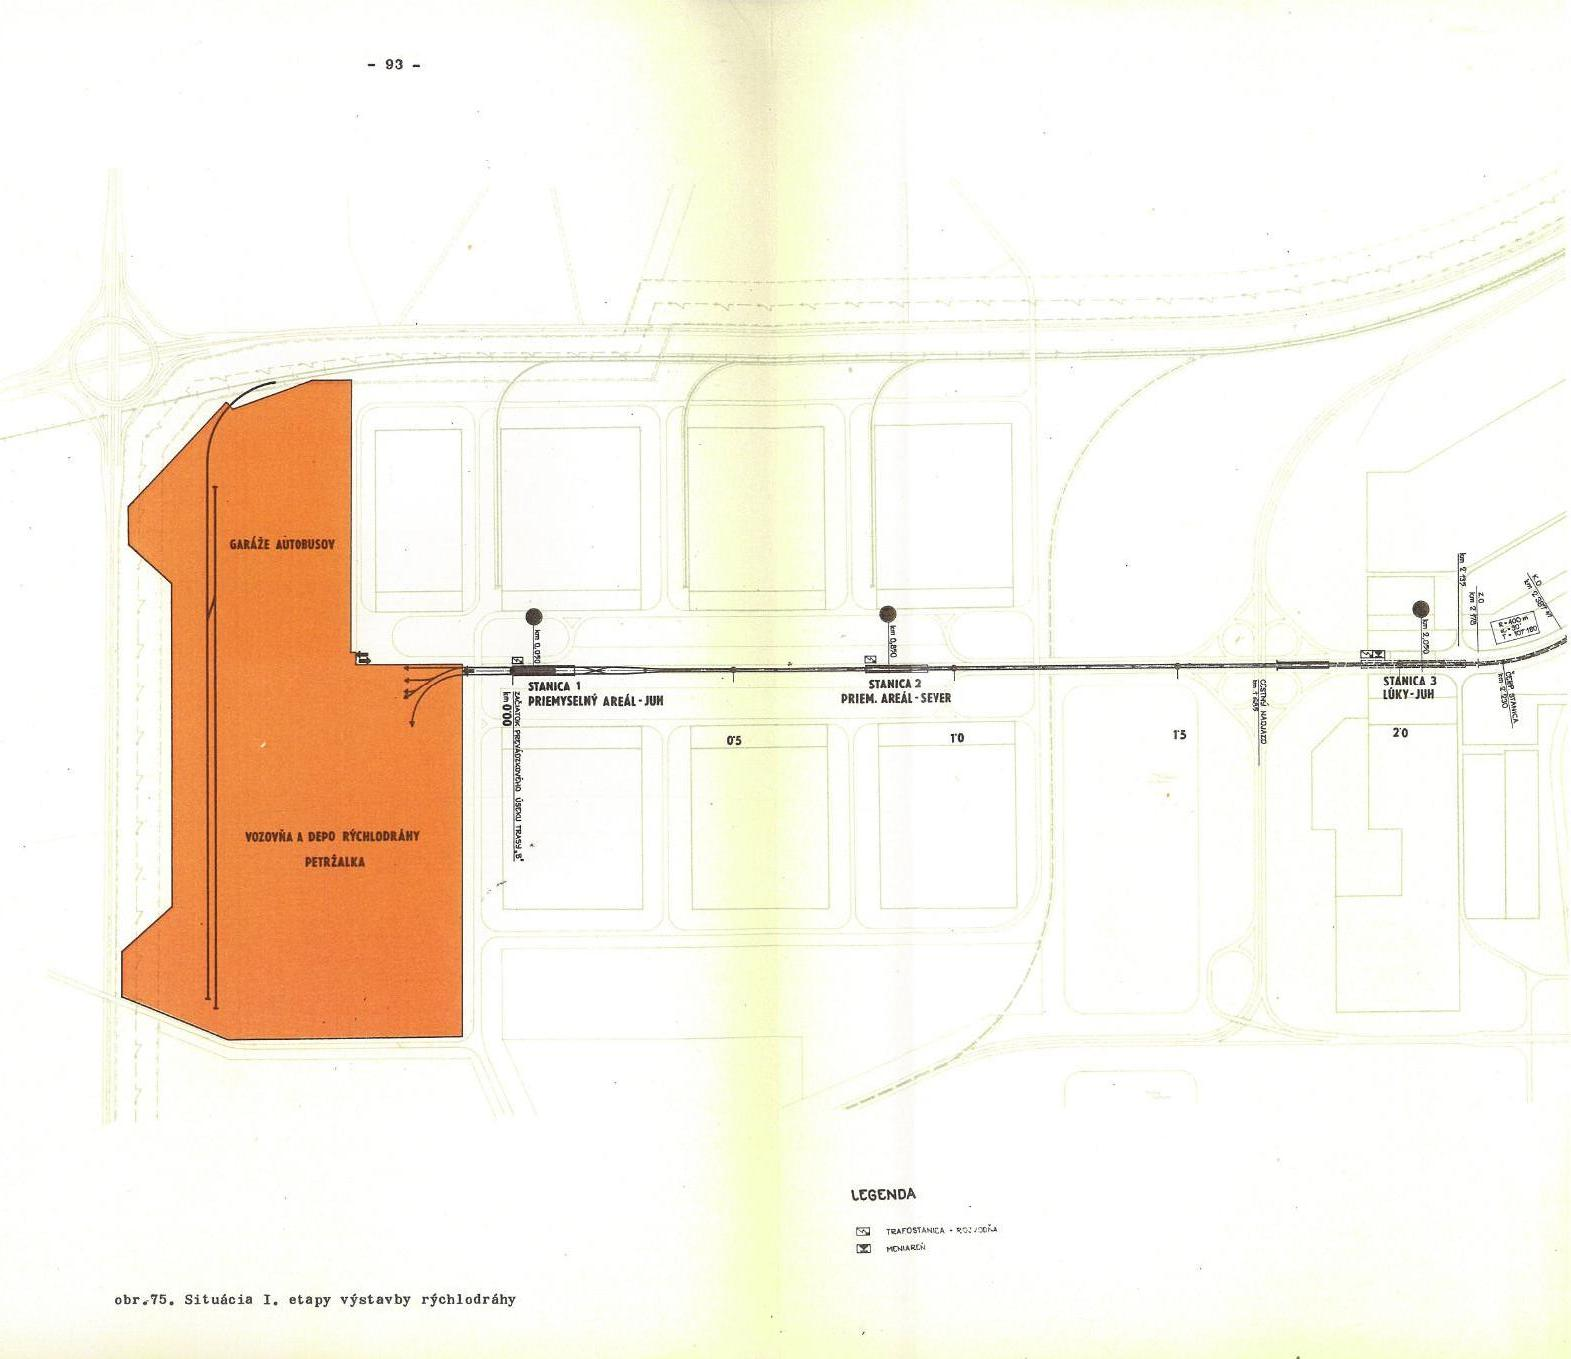 Metro I etapa - trasa 2C 1-3